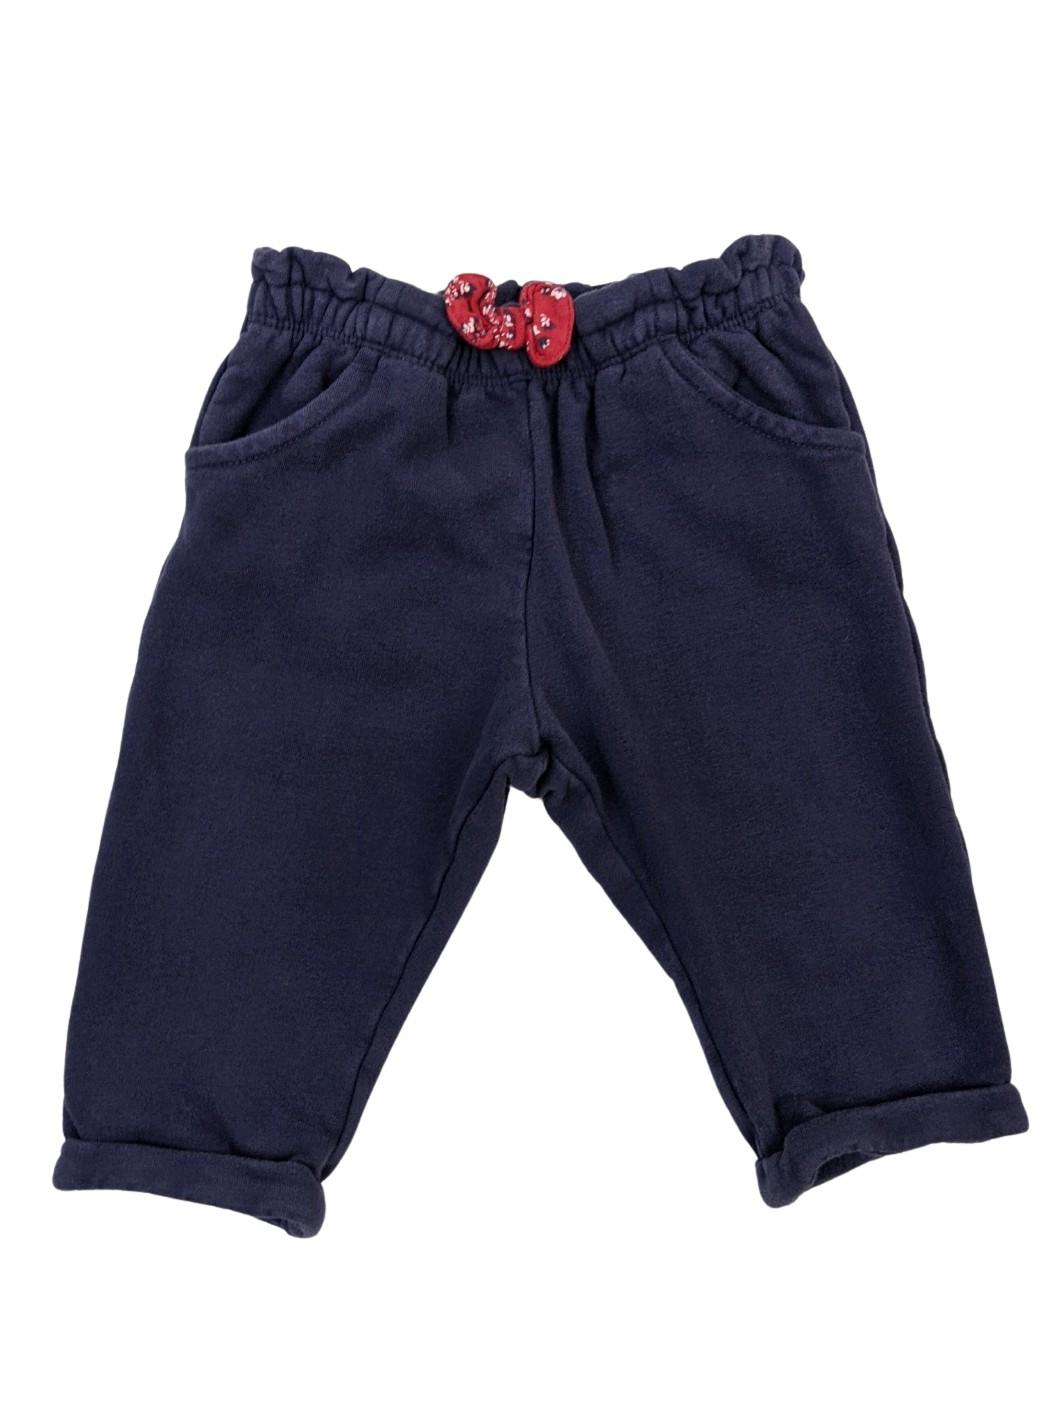 Pantalon de jogging 1